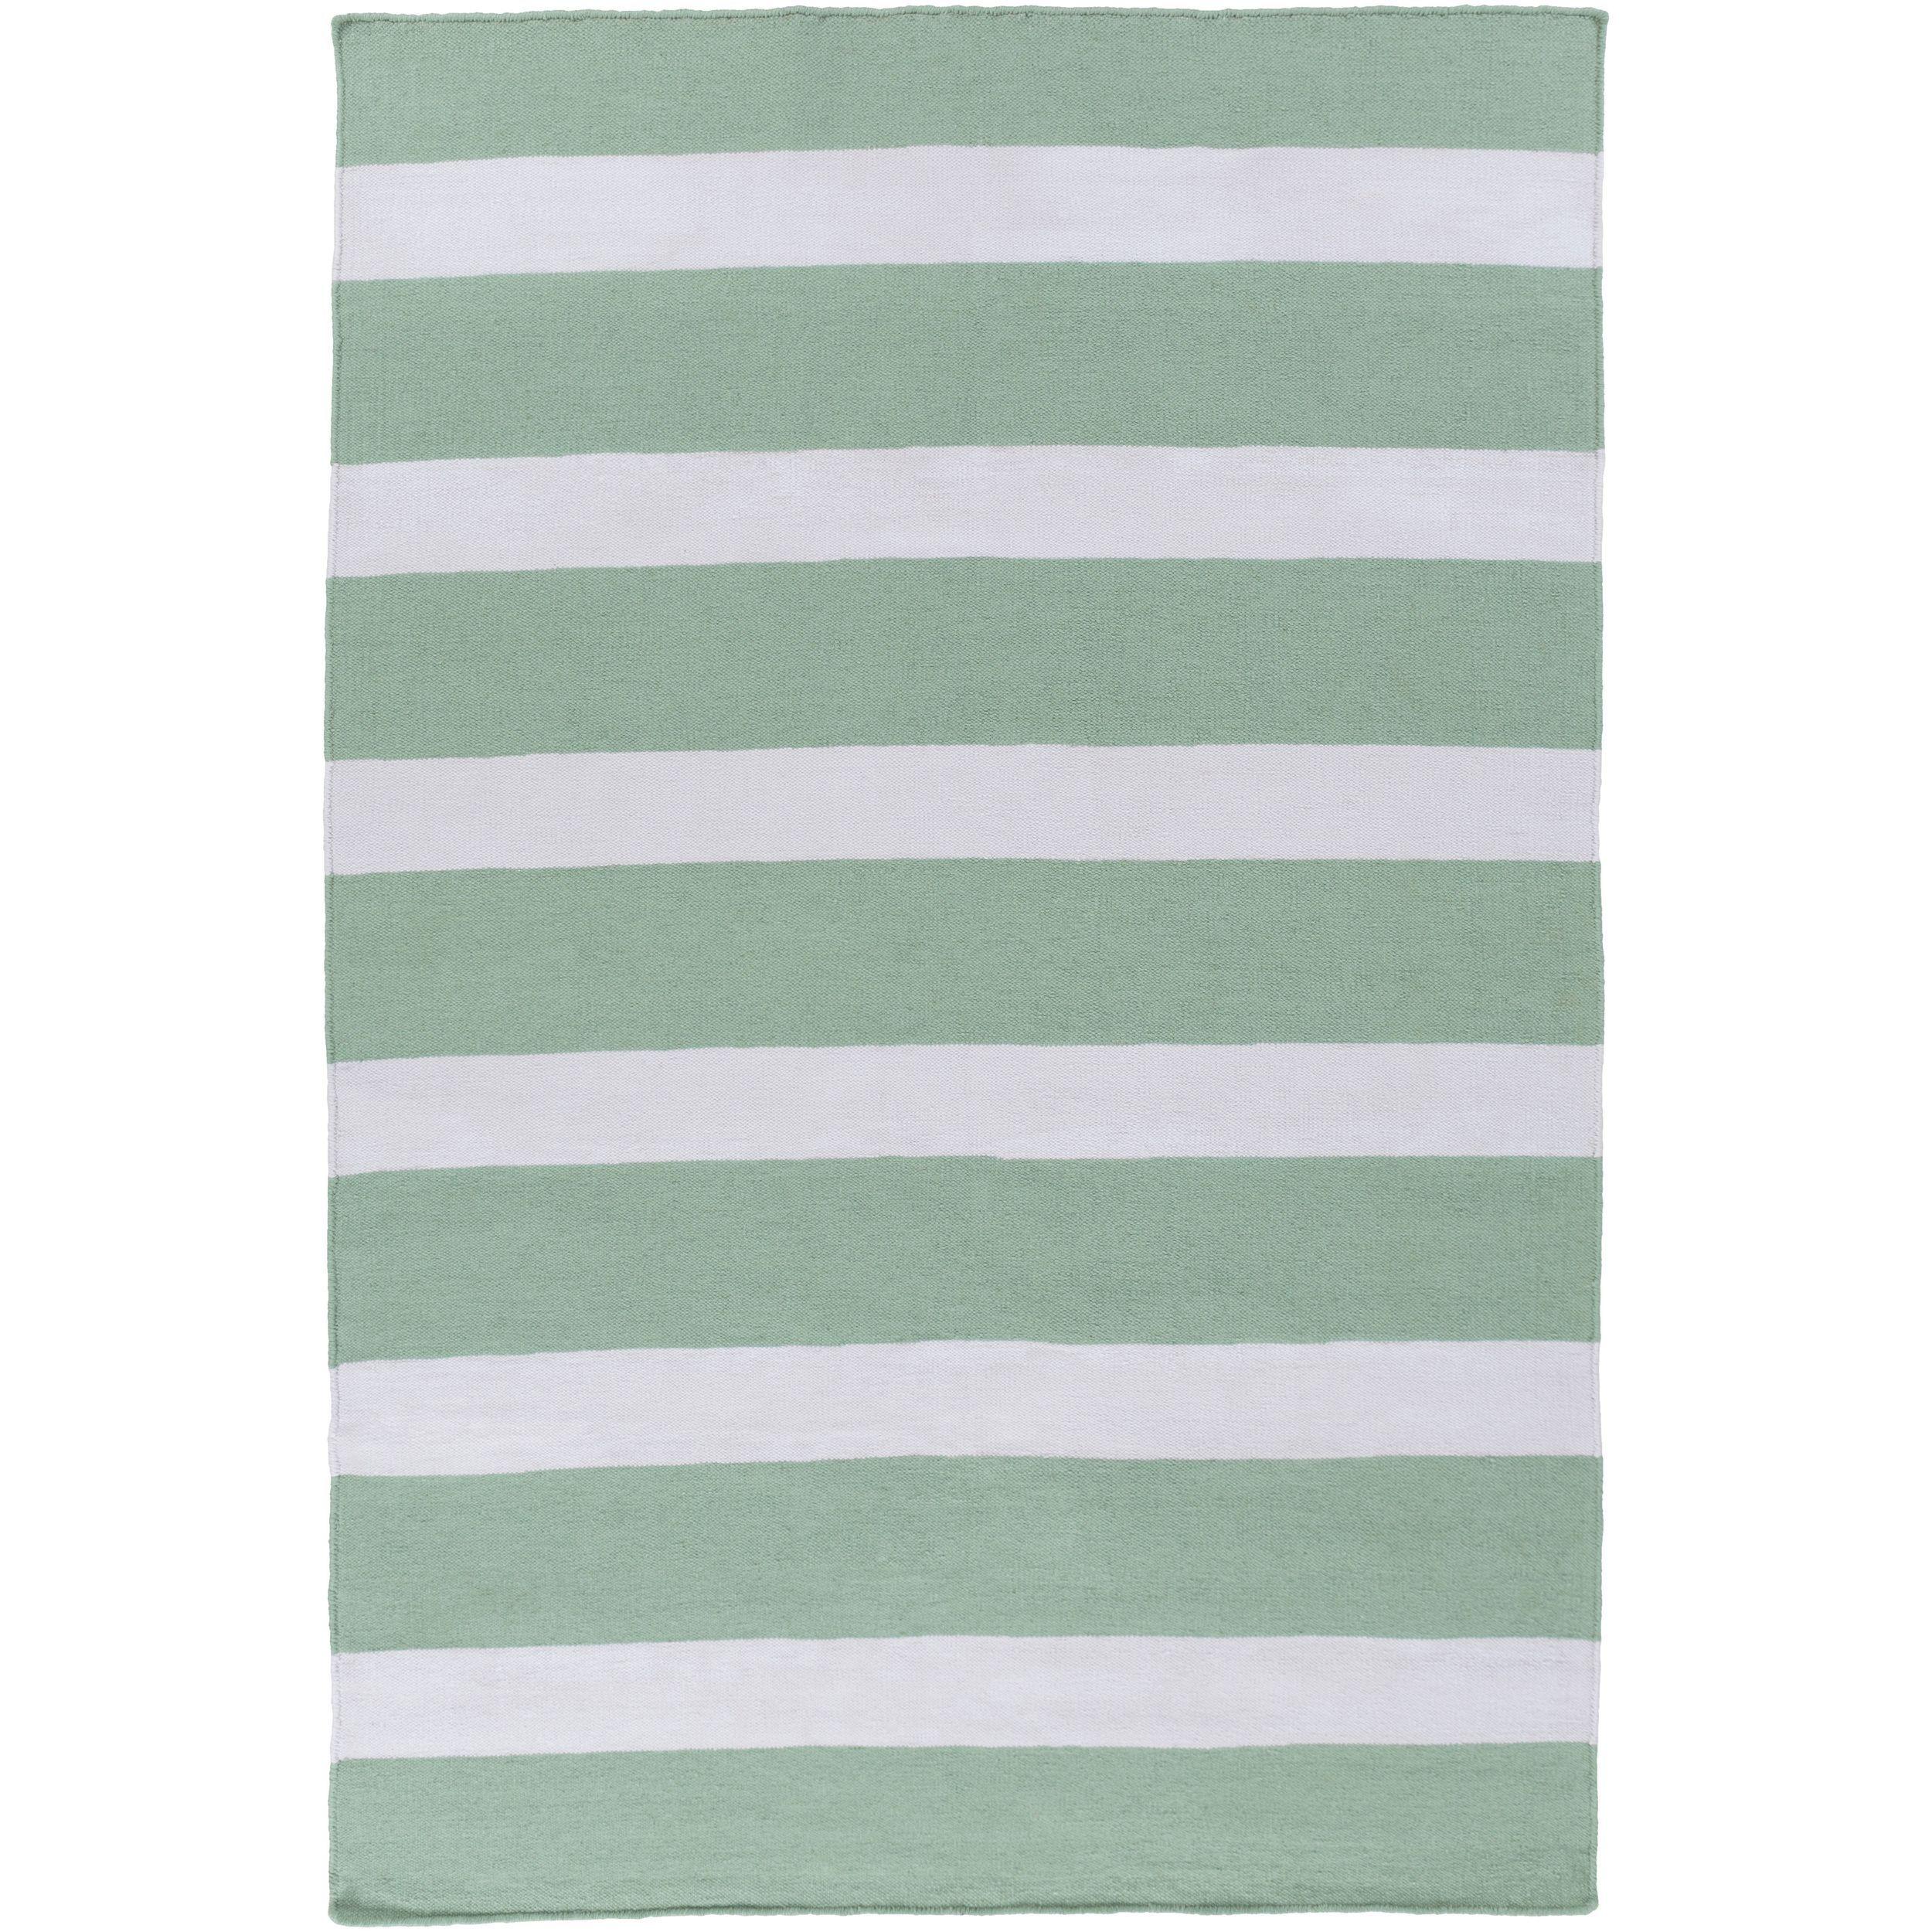 Hand Woven Shelley Stripe Pattern Indoor Outdoor Rug 3 6 X 5 6